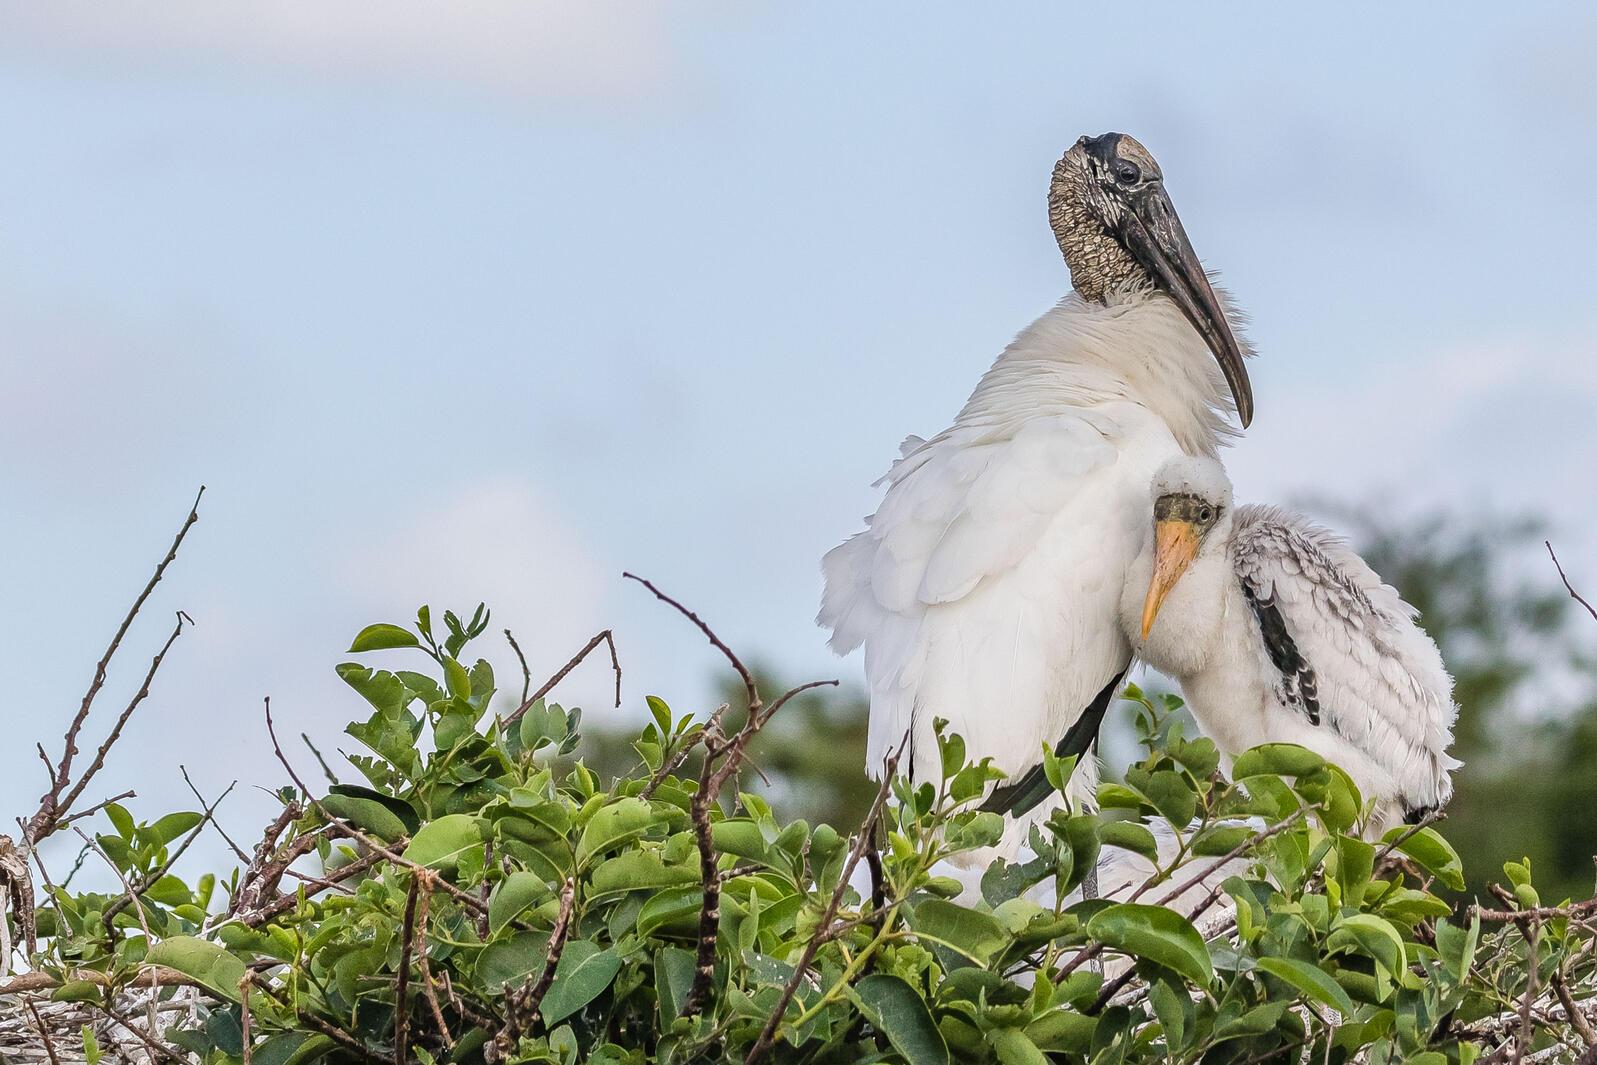 Wood Stork with nestling. Lorraine Minns/Audubon Photography Awards